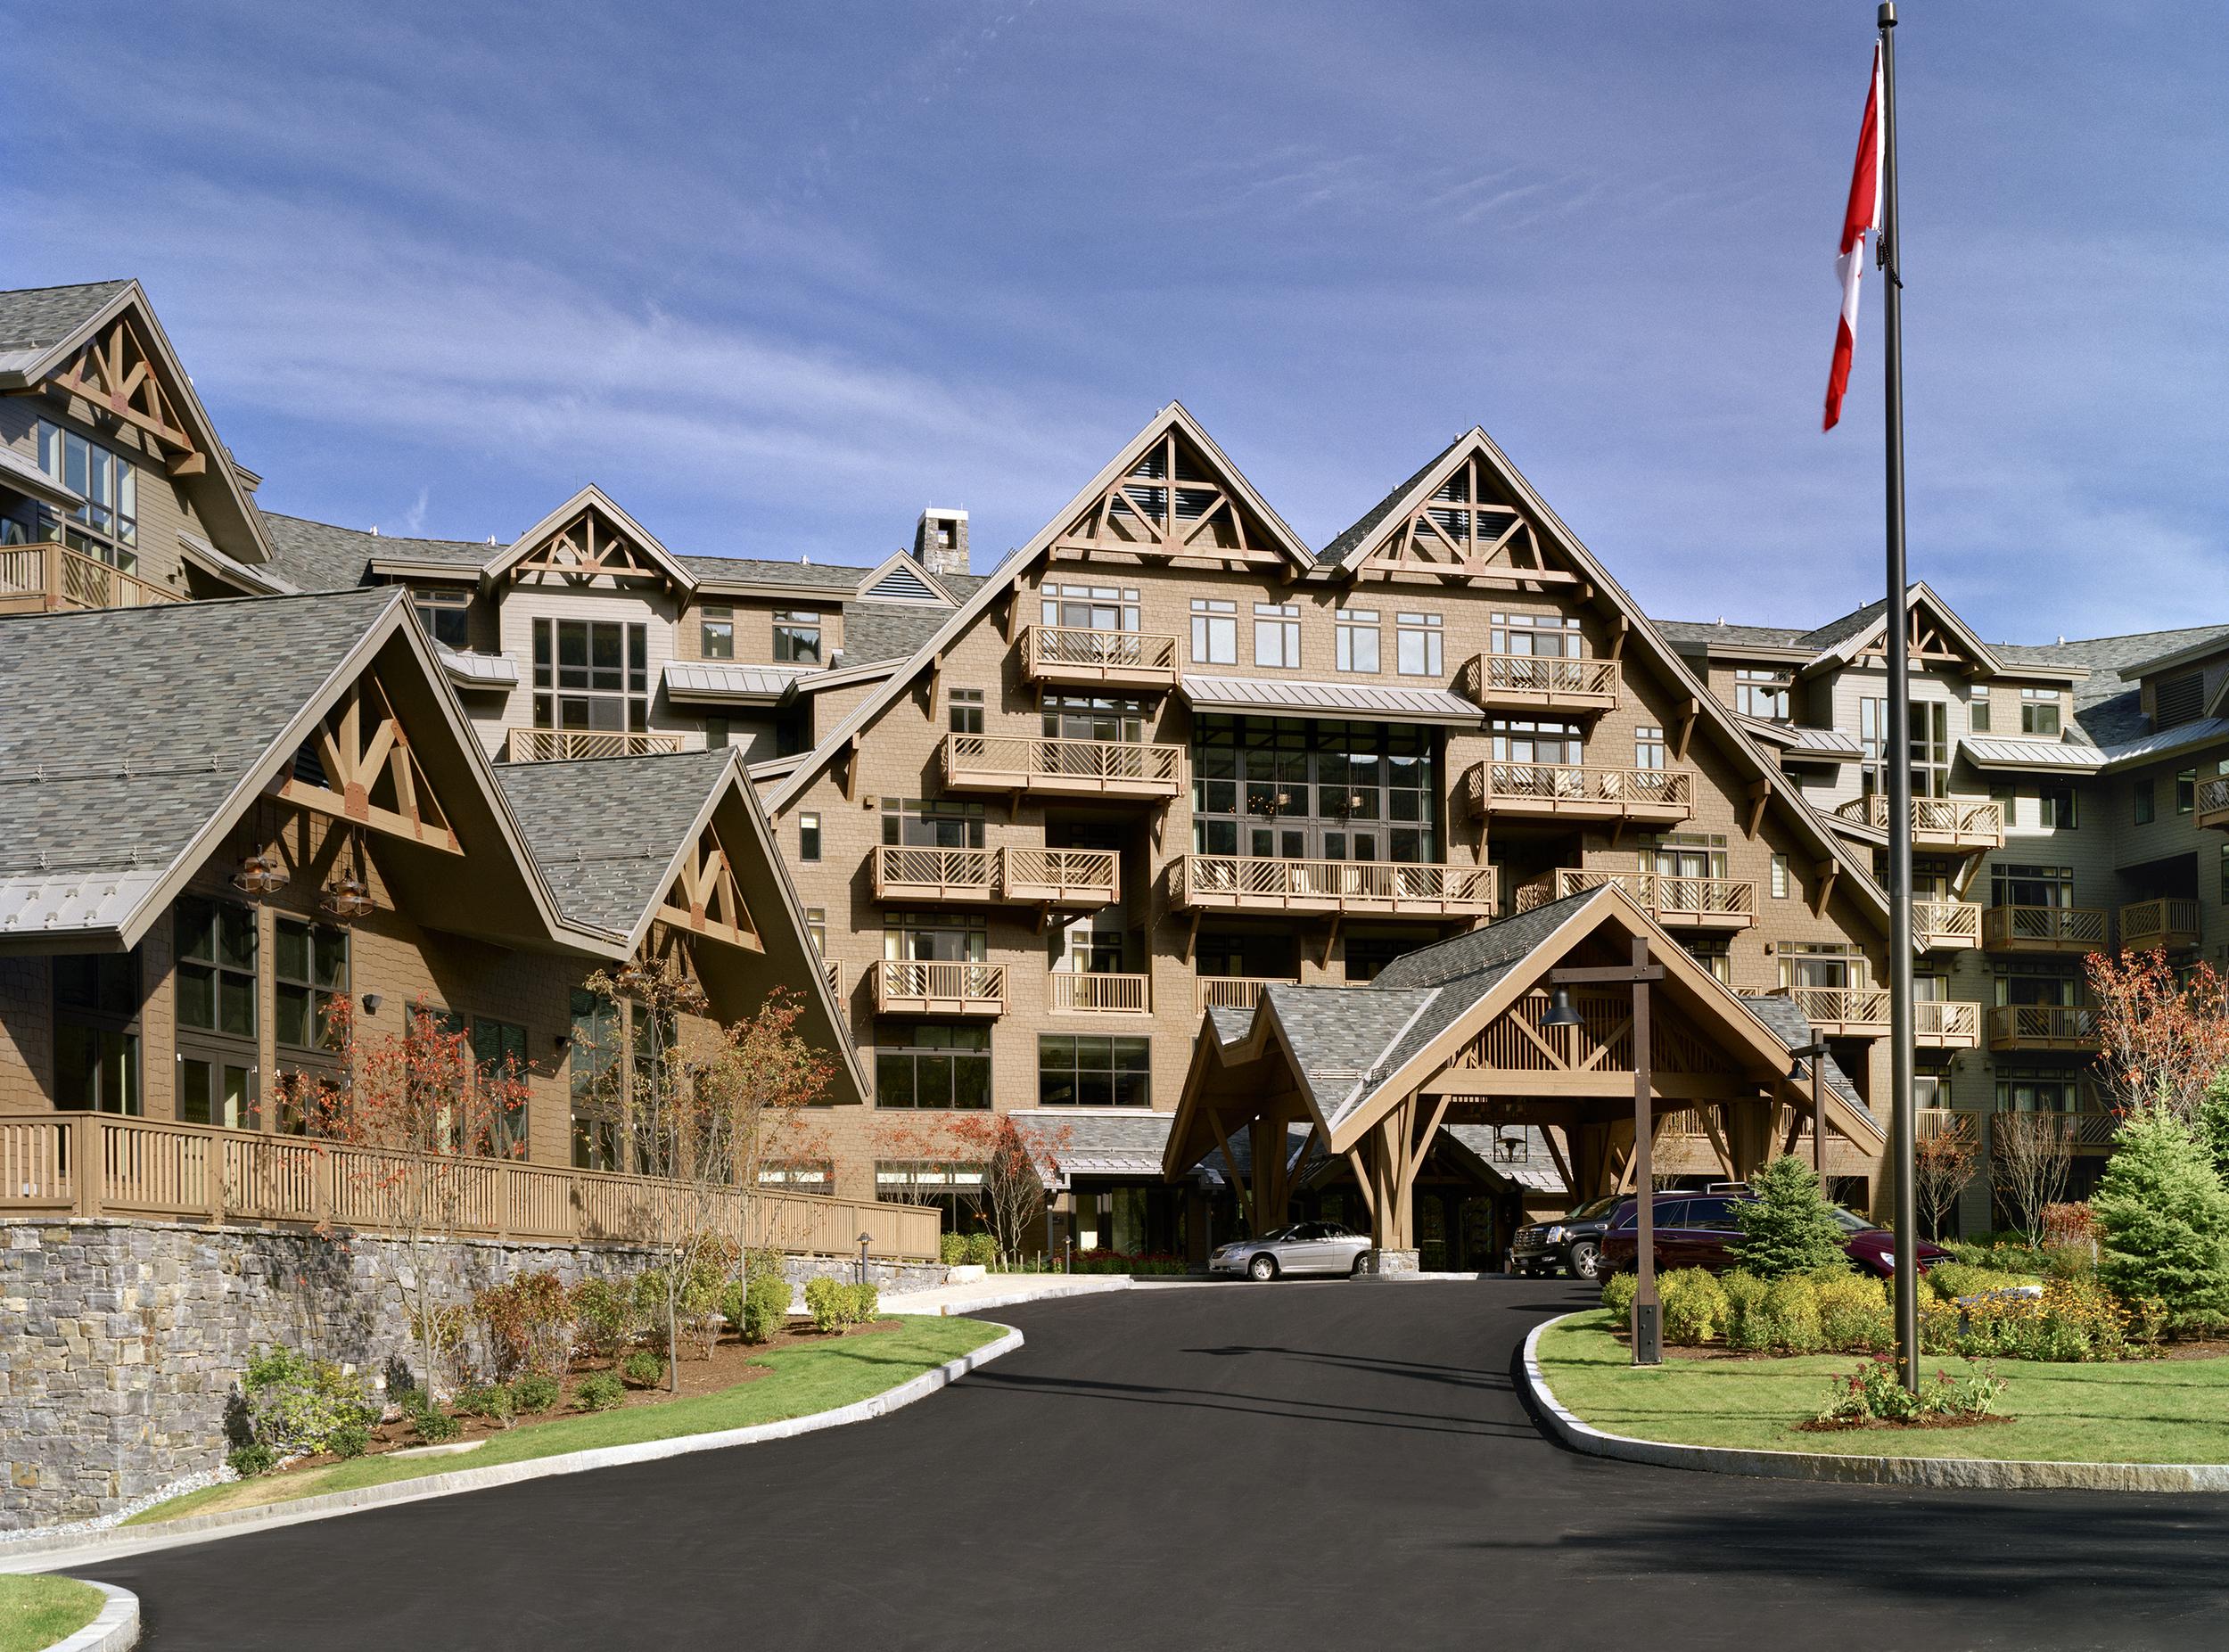 Stowe Mountain Lodge >> Stowe Mountain Lodge 4240 Architecture